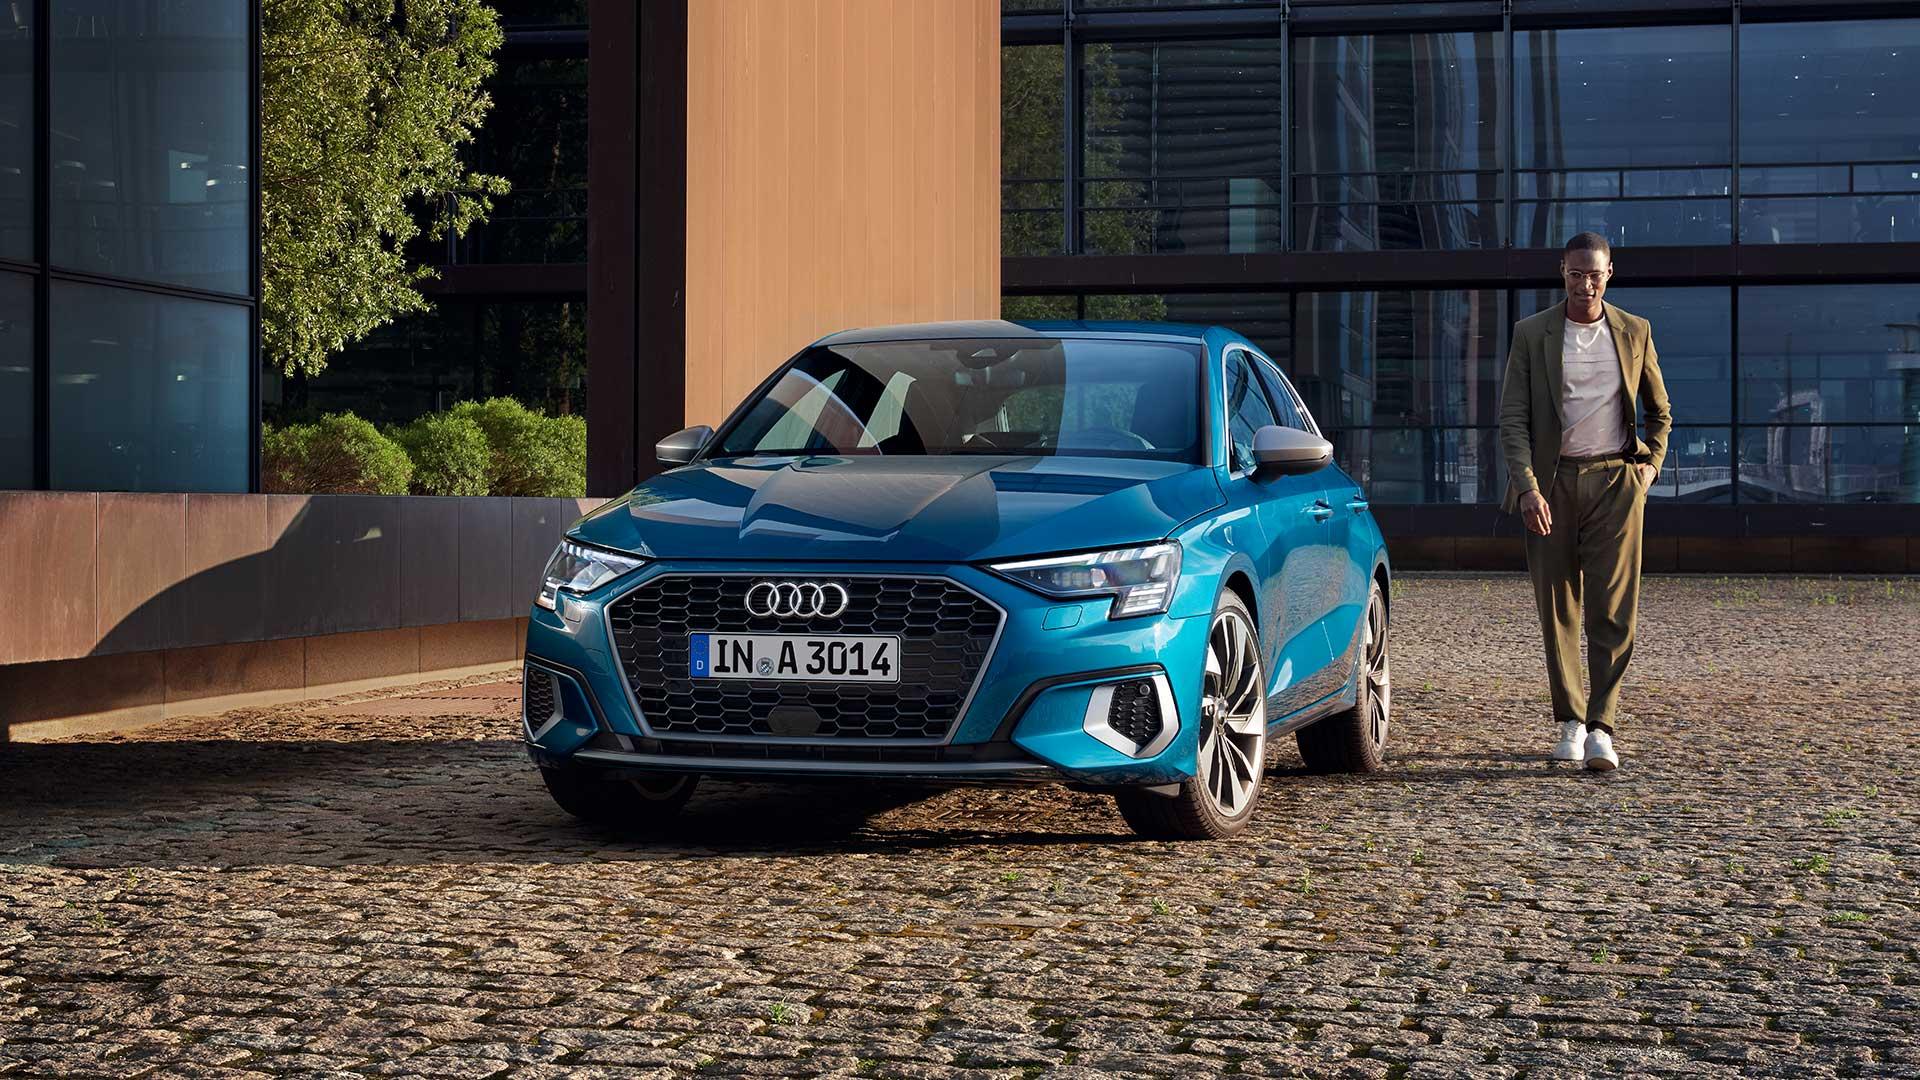 Kelebihan Audi 13 Top Model Tahun Ini